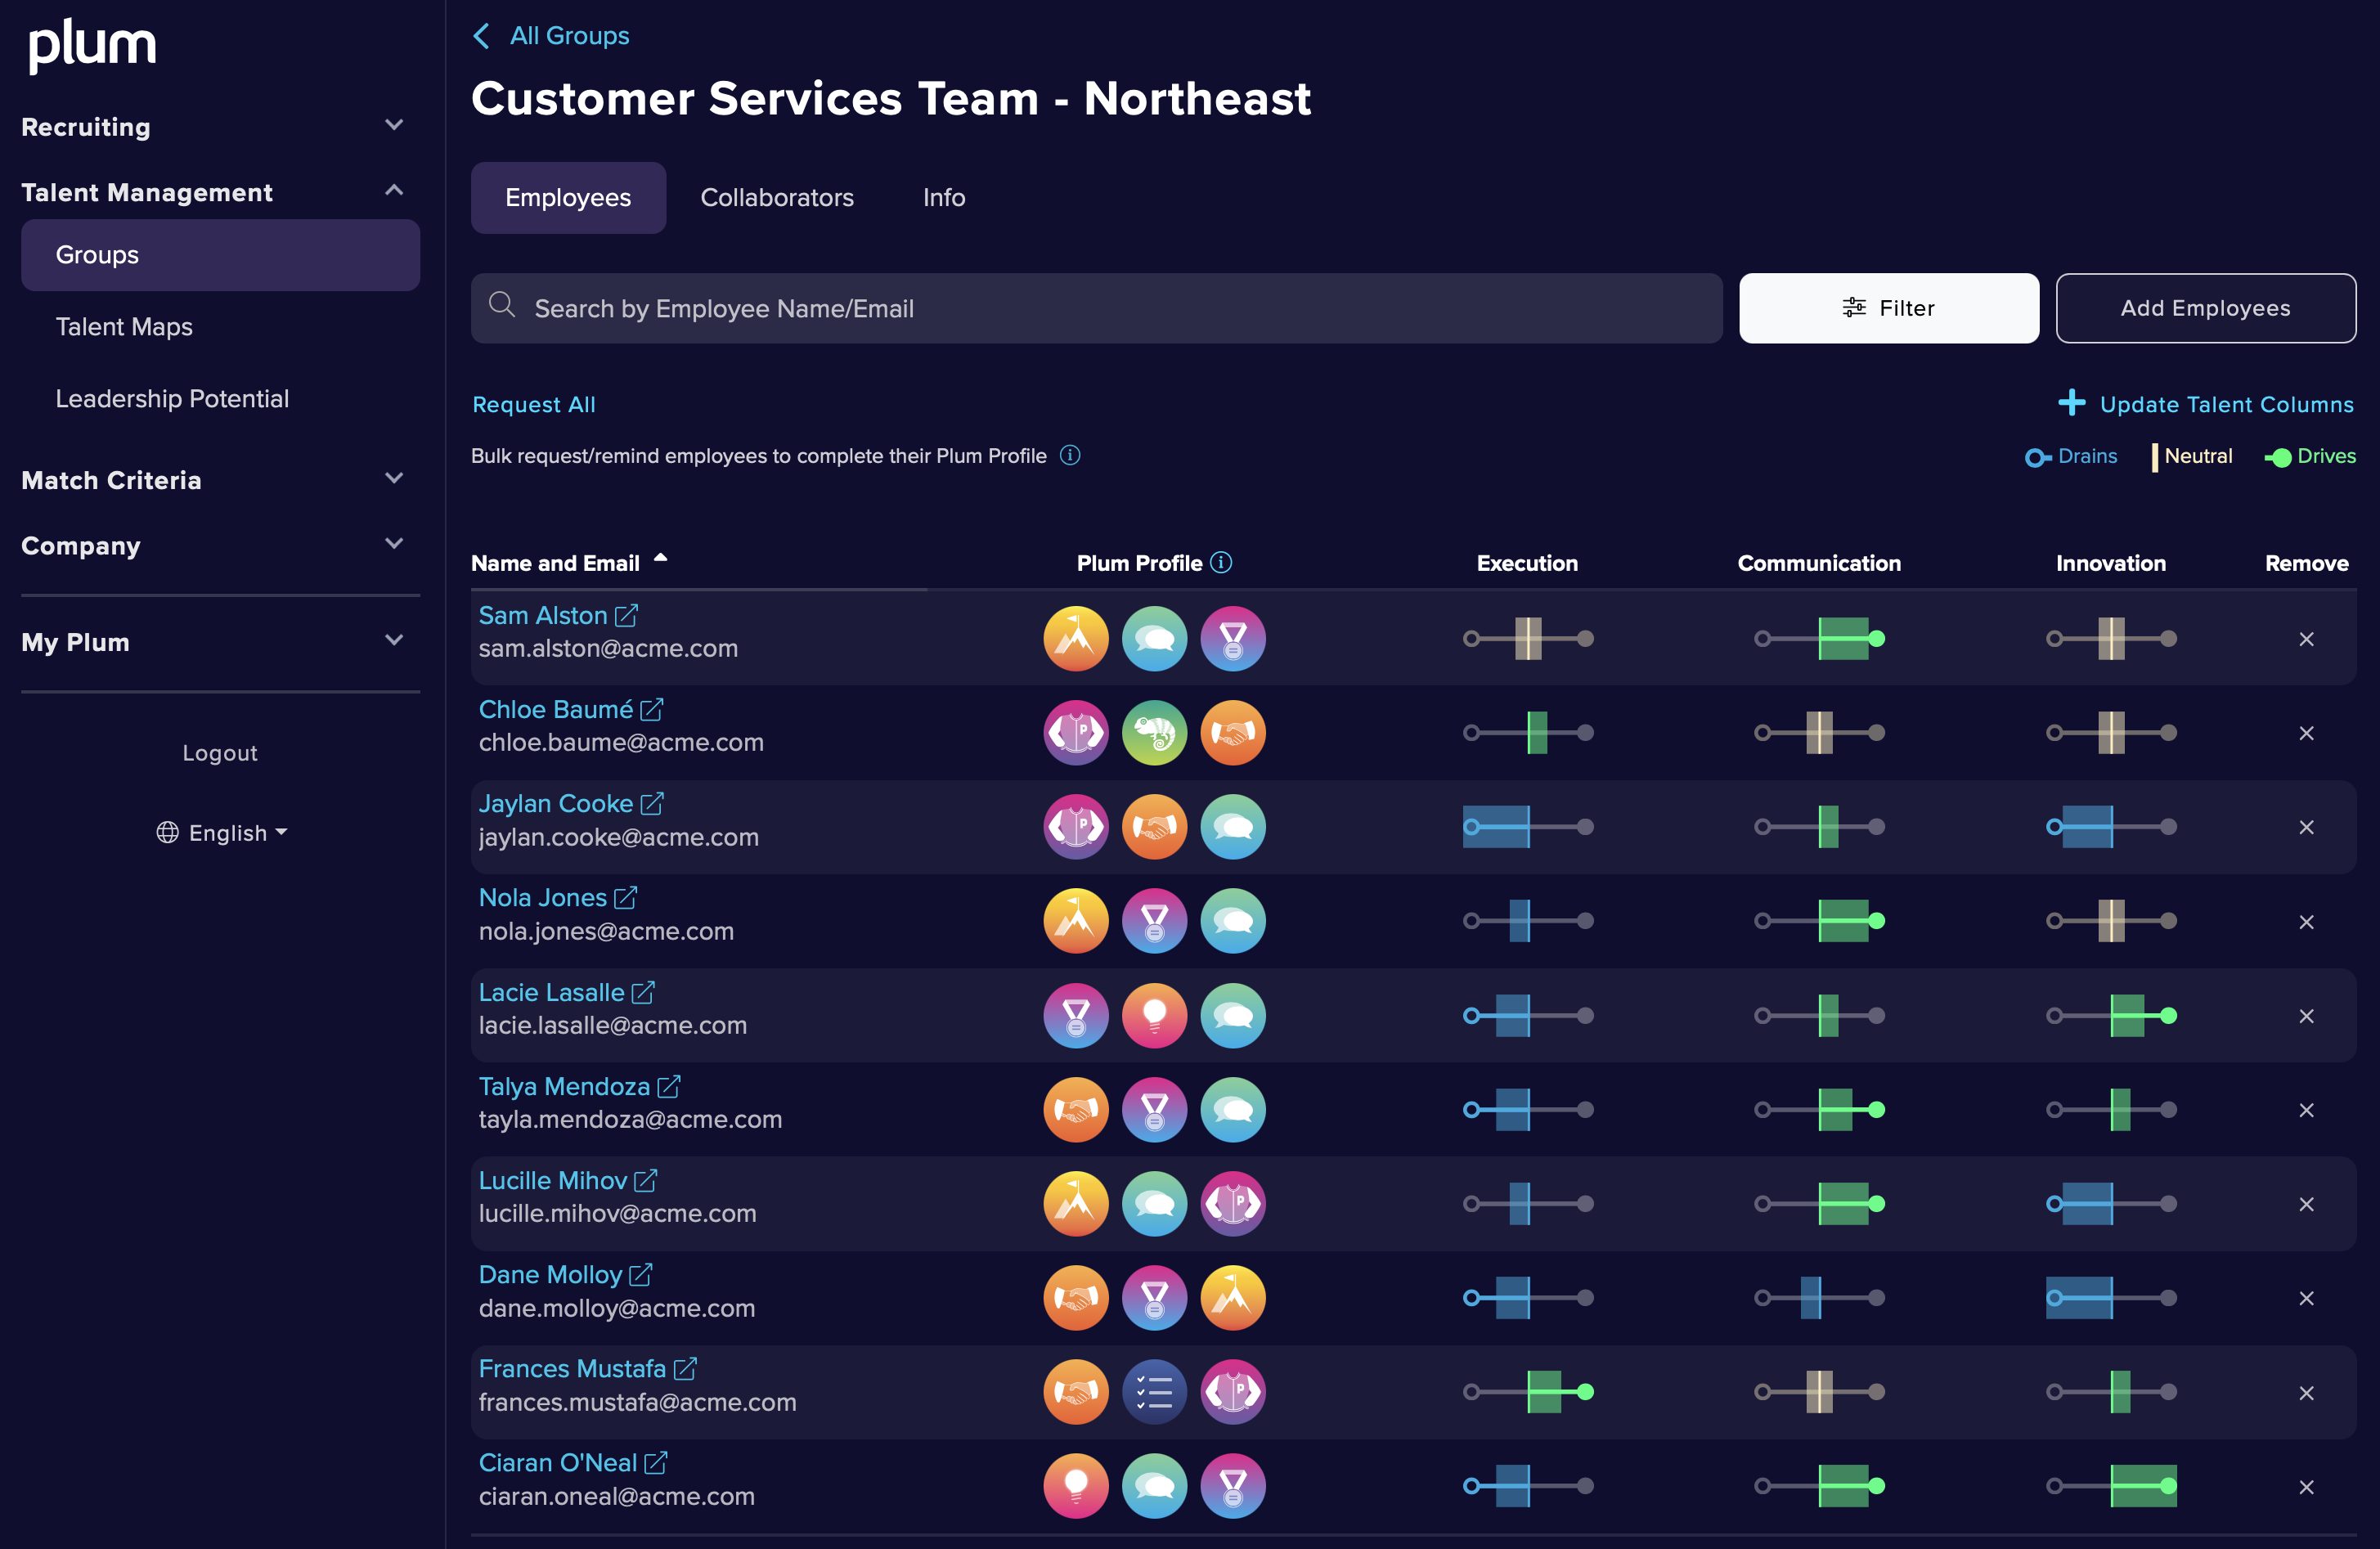 groups-team-screenshot-actual